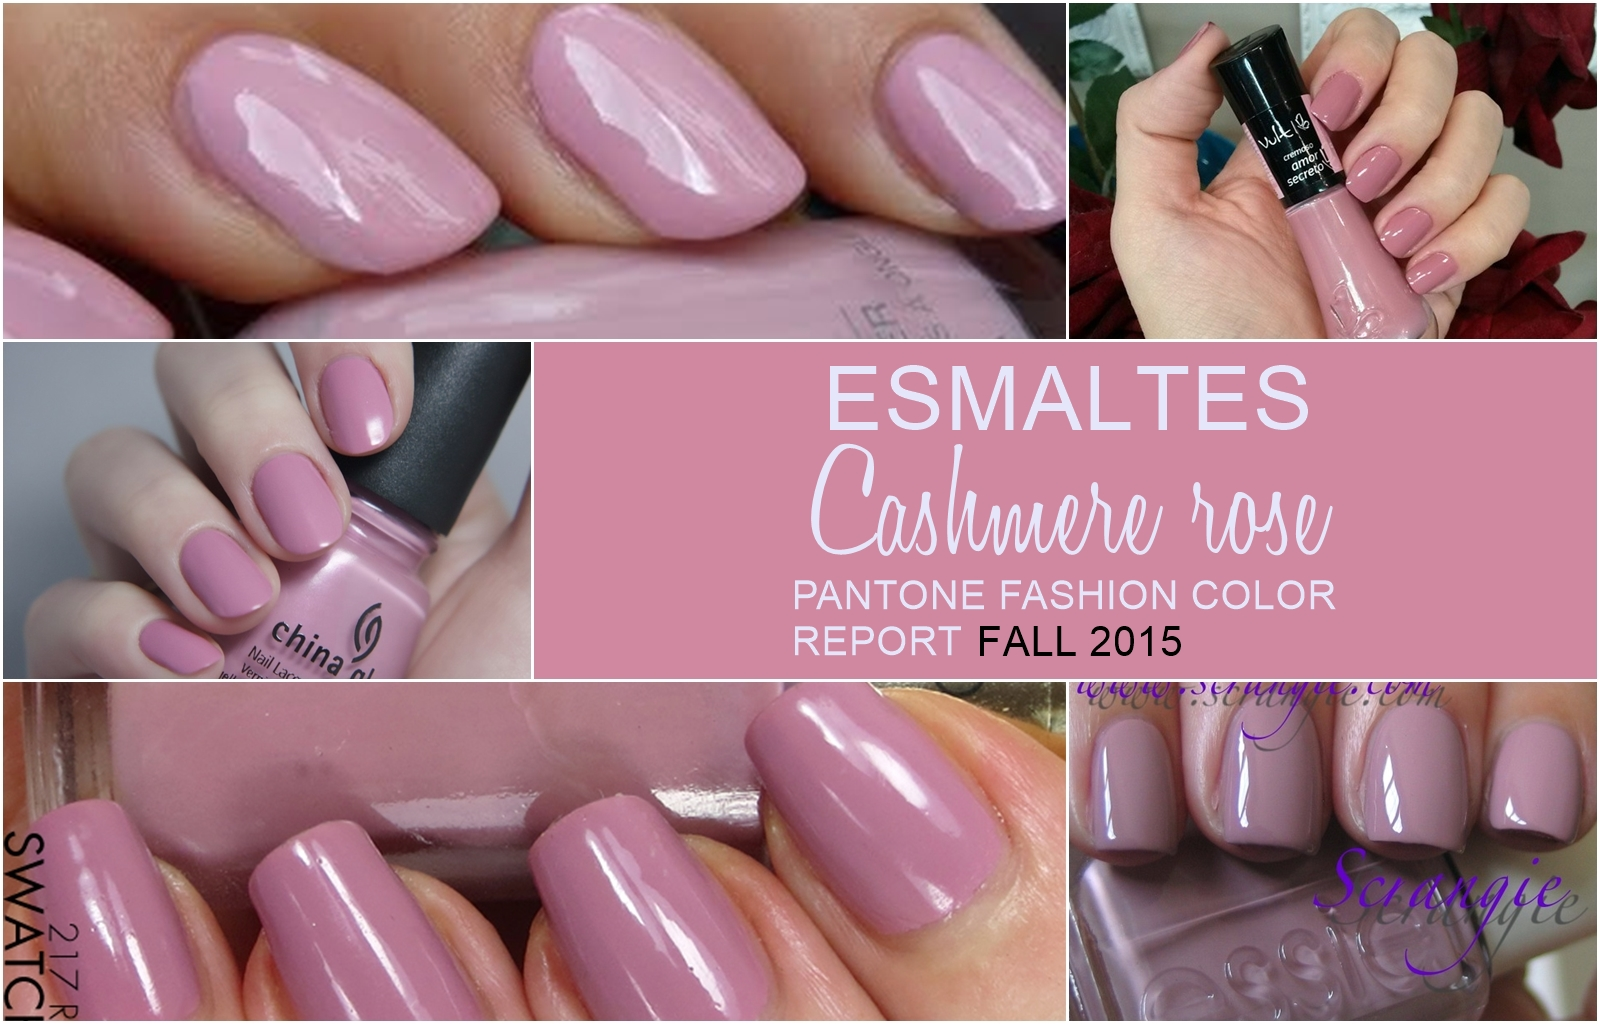 Pantone Fashion Color Report Fall 2015: Cashmere rose - Confesiones ...